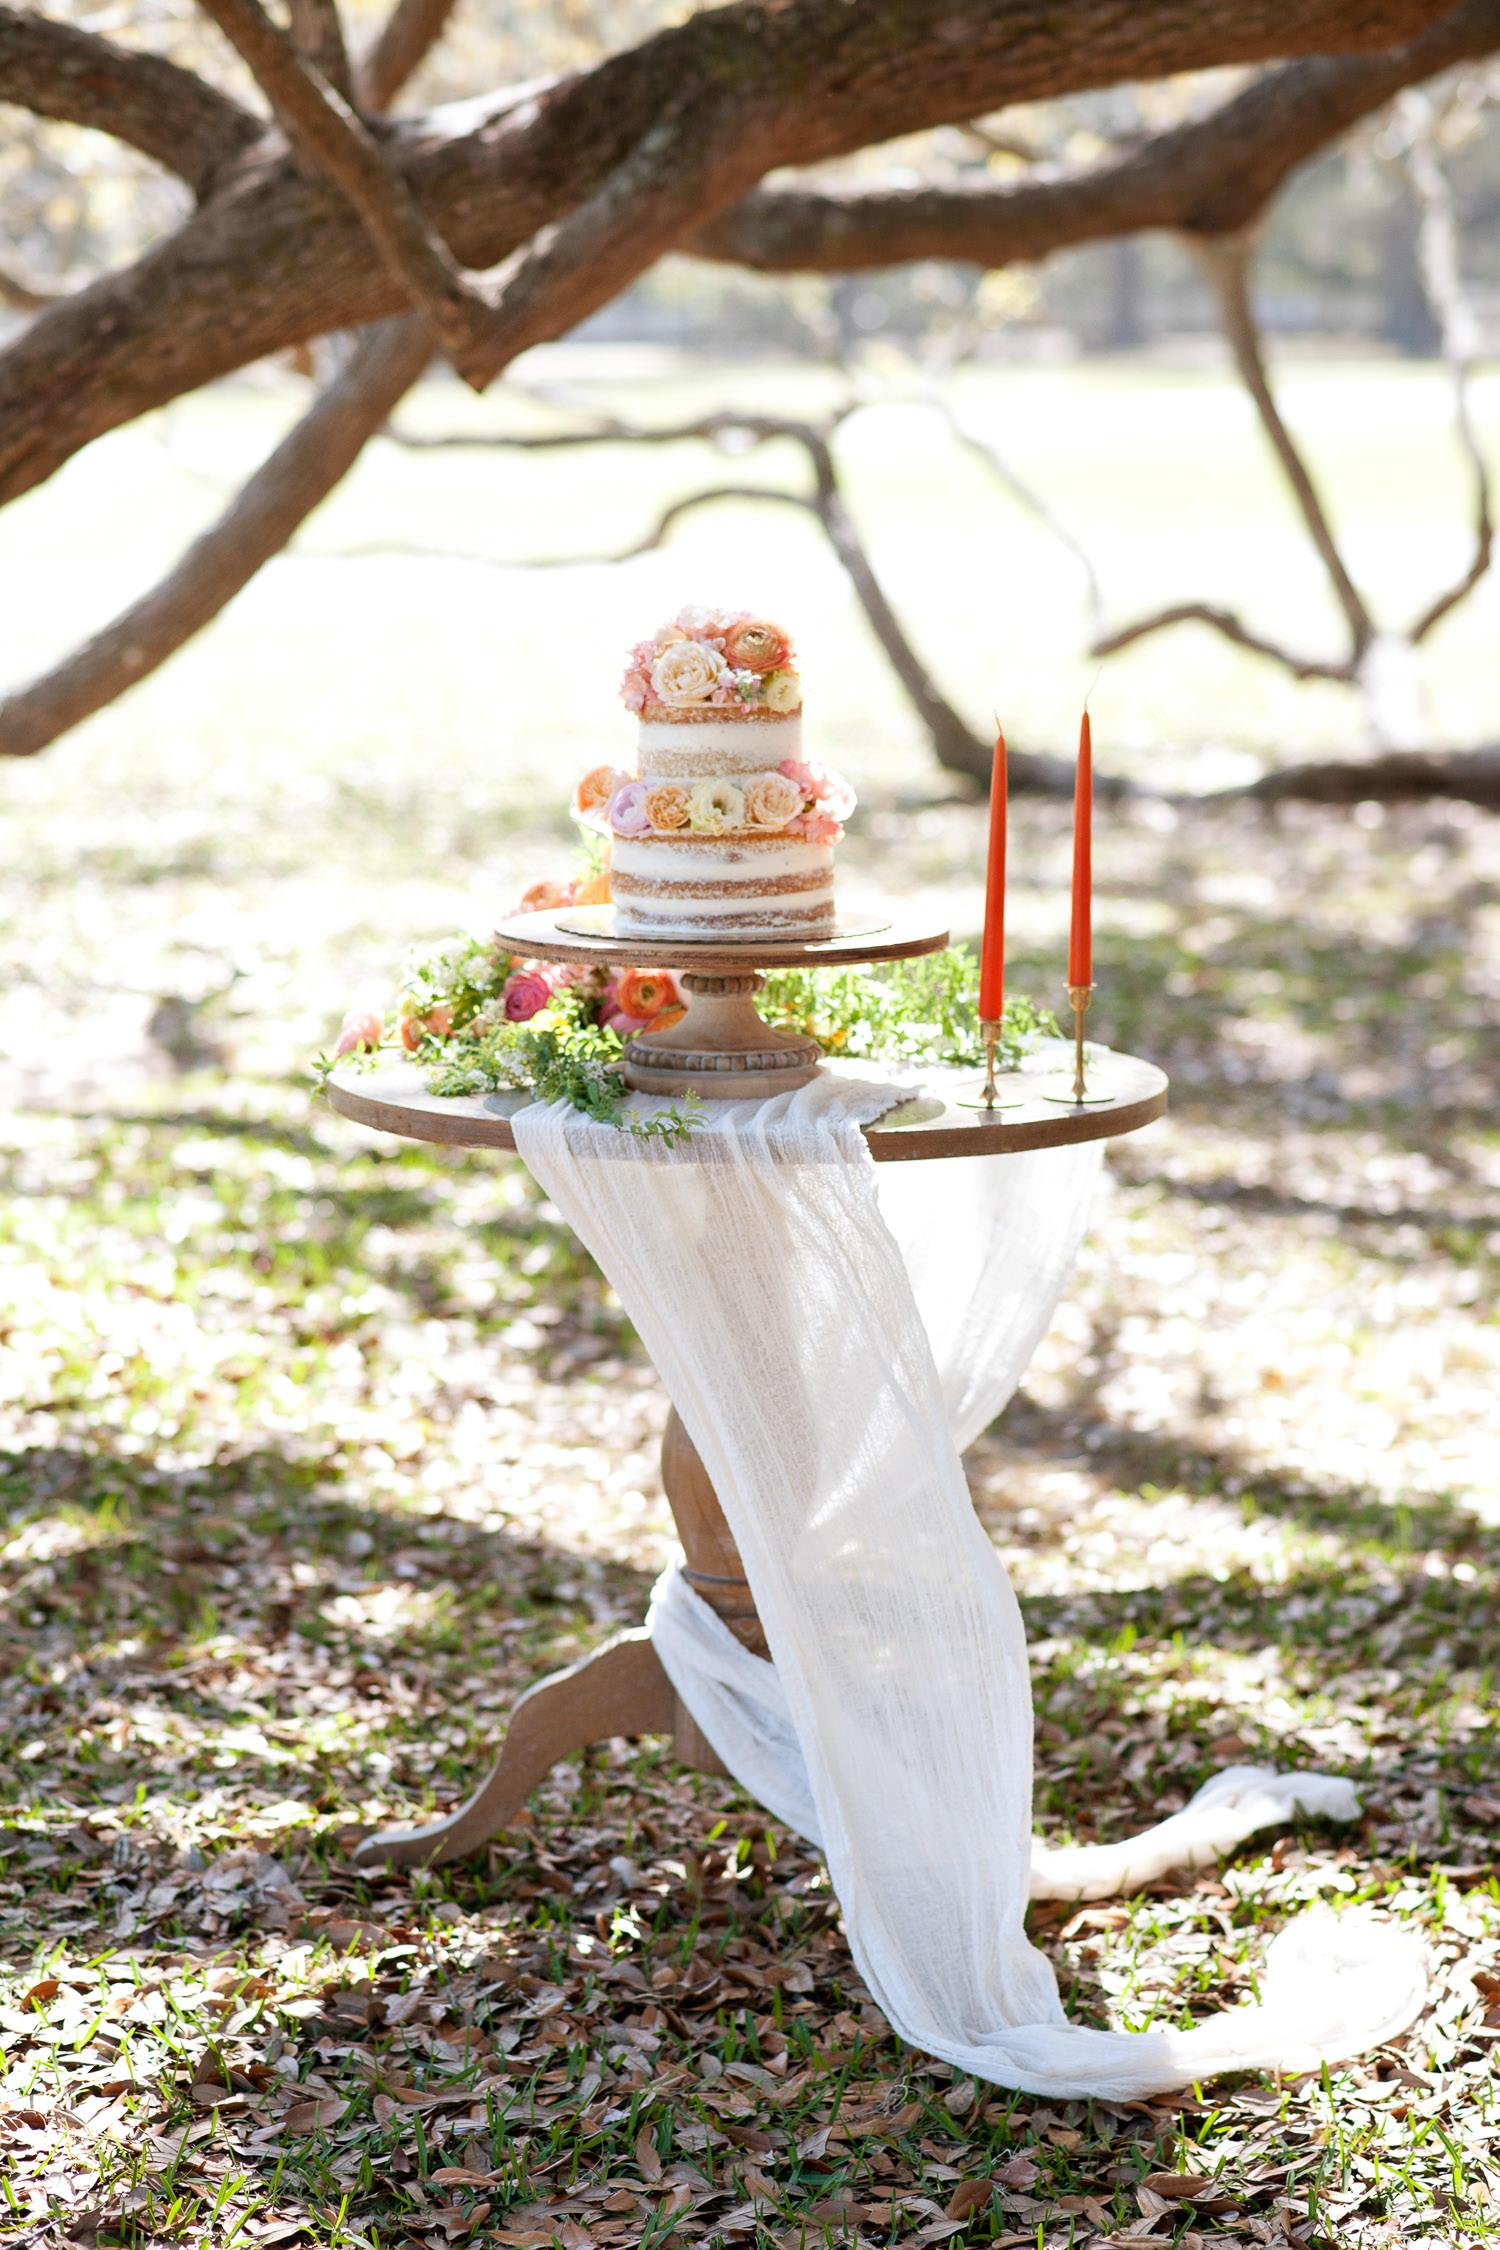 wedding cake inspiration for a garden wedding captured by Tara Whittaker Photography